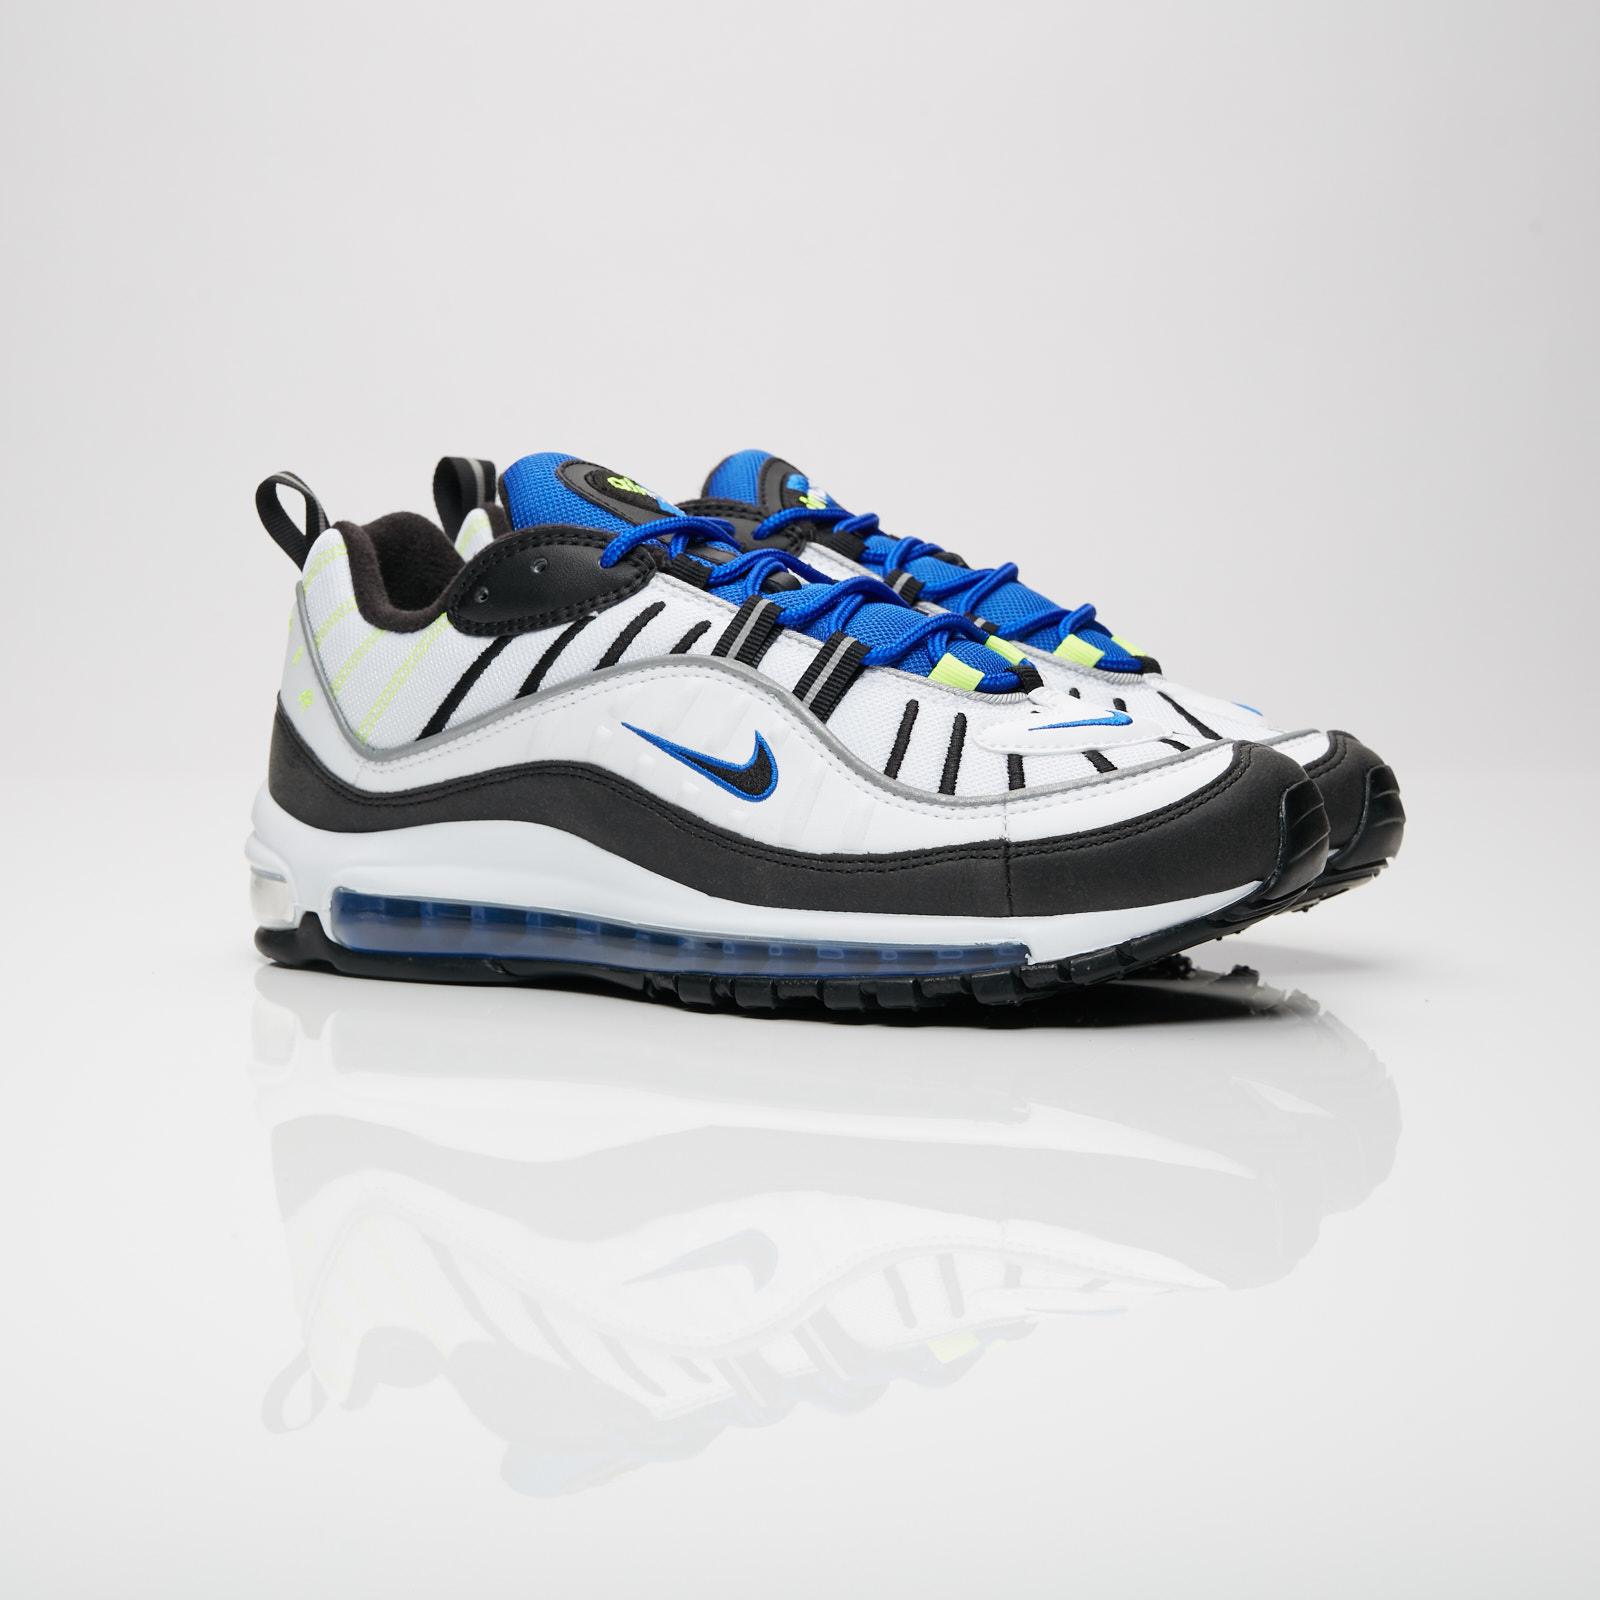 best service b2ee8 cdbf8 Nike Sportswear Air Max 98